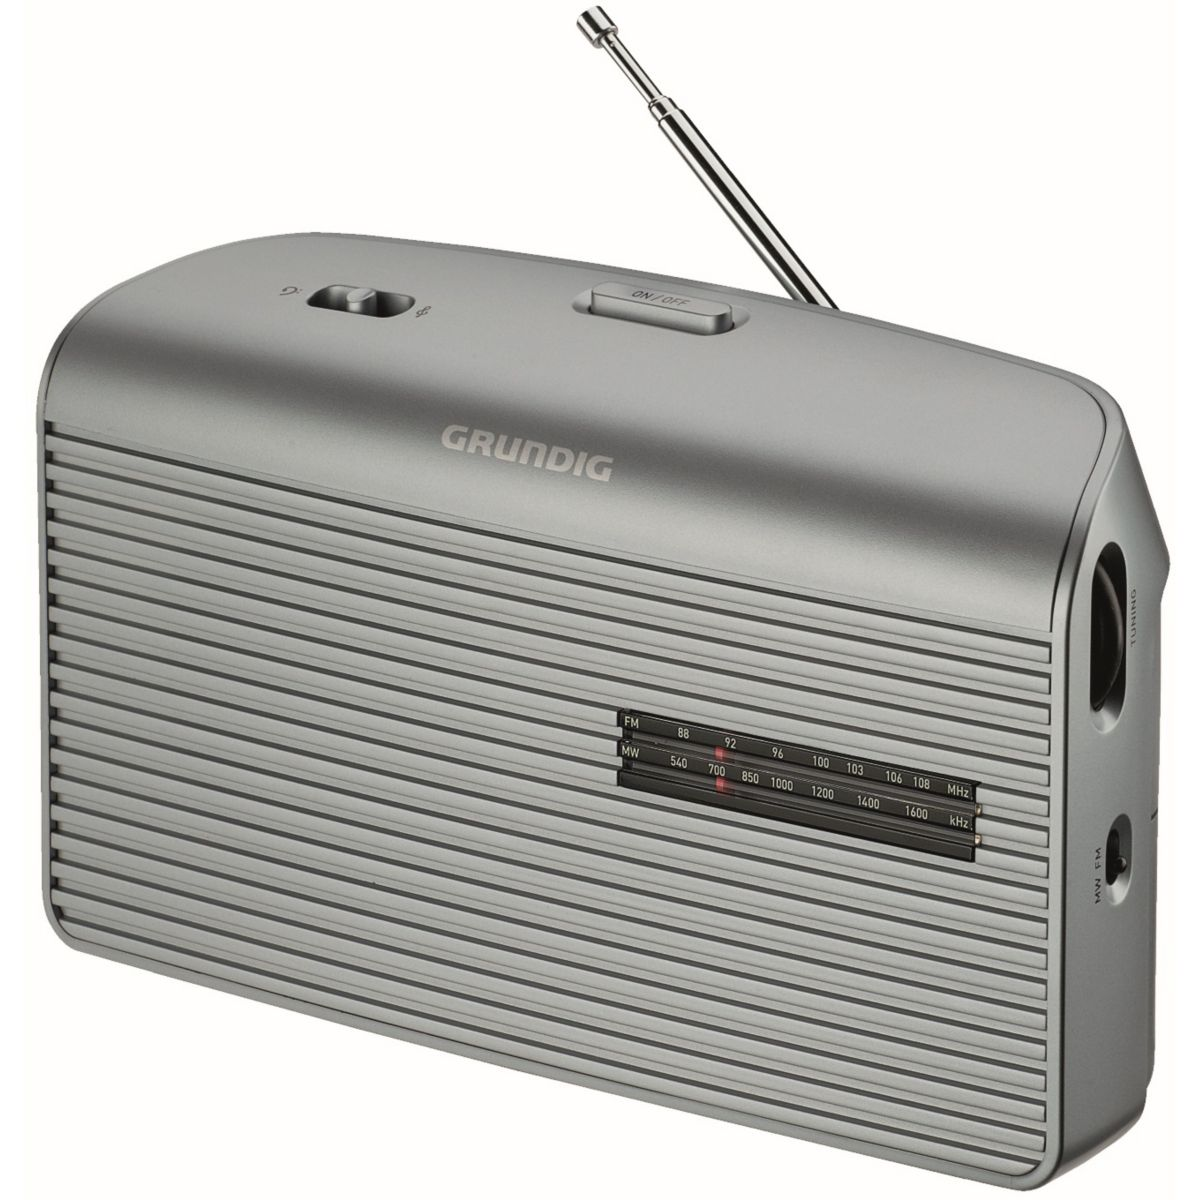 Radio grundig music 60 l gris (photo)